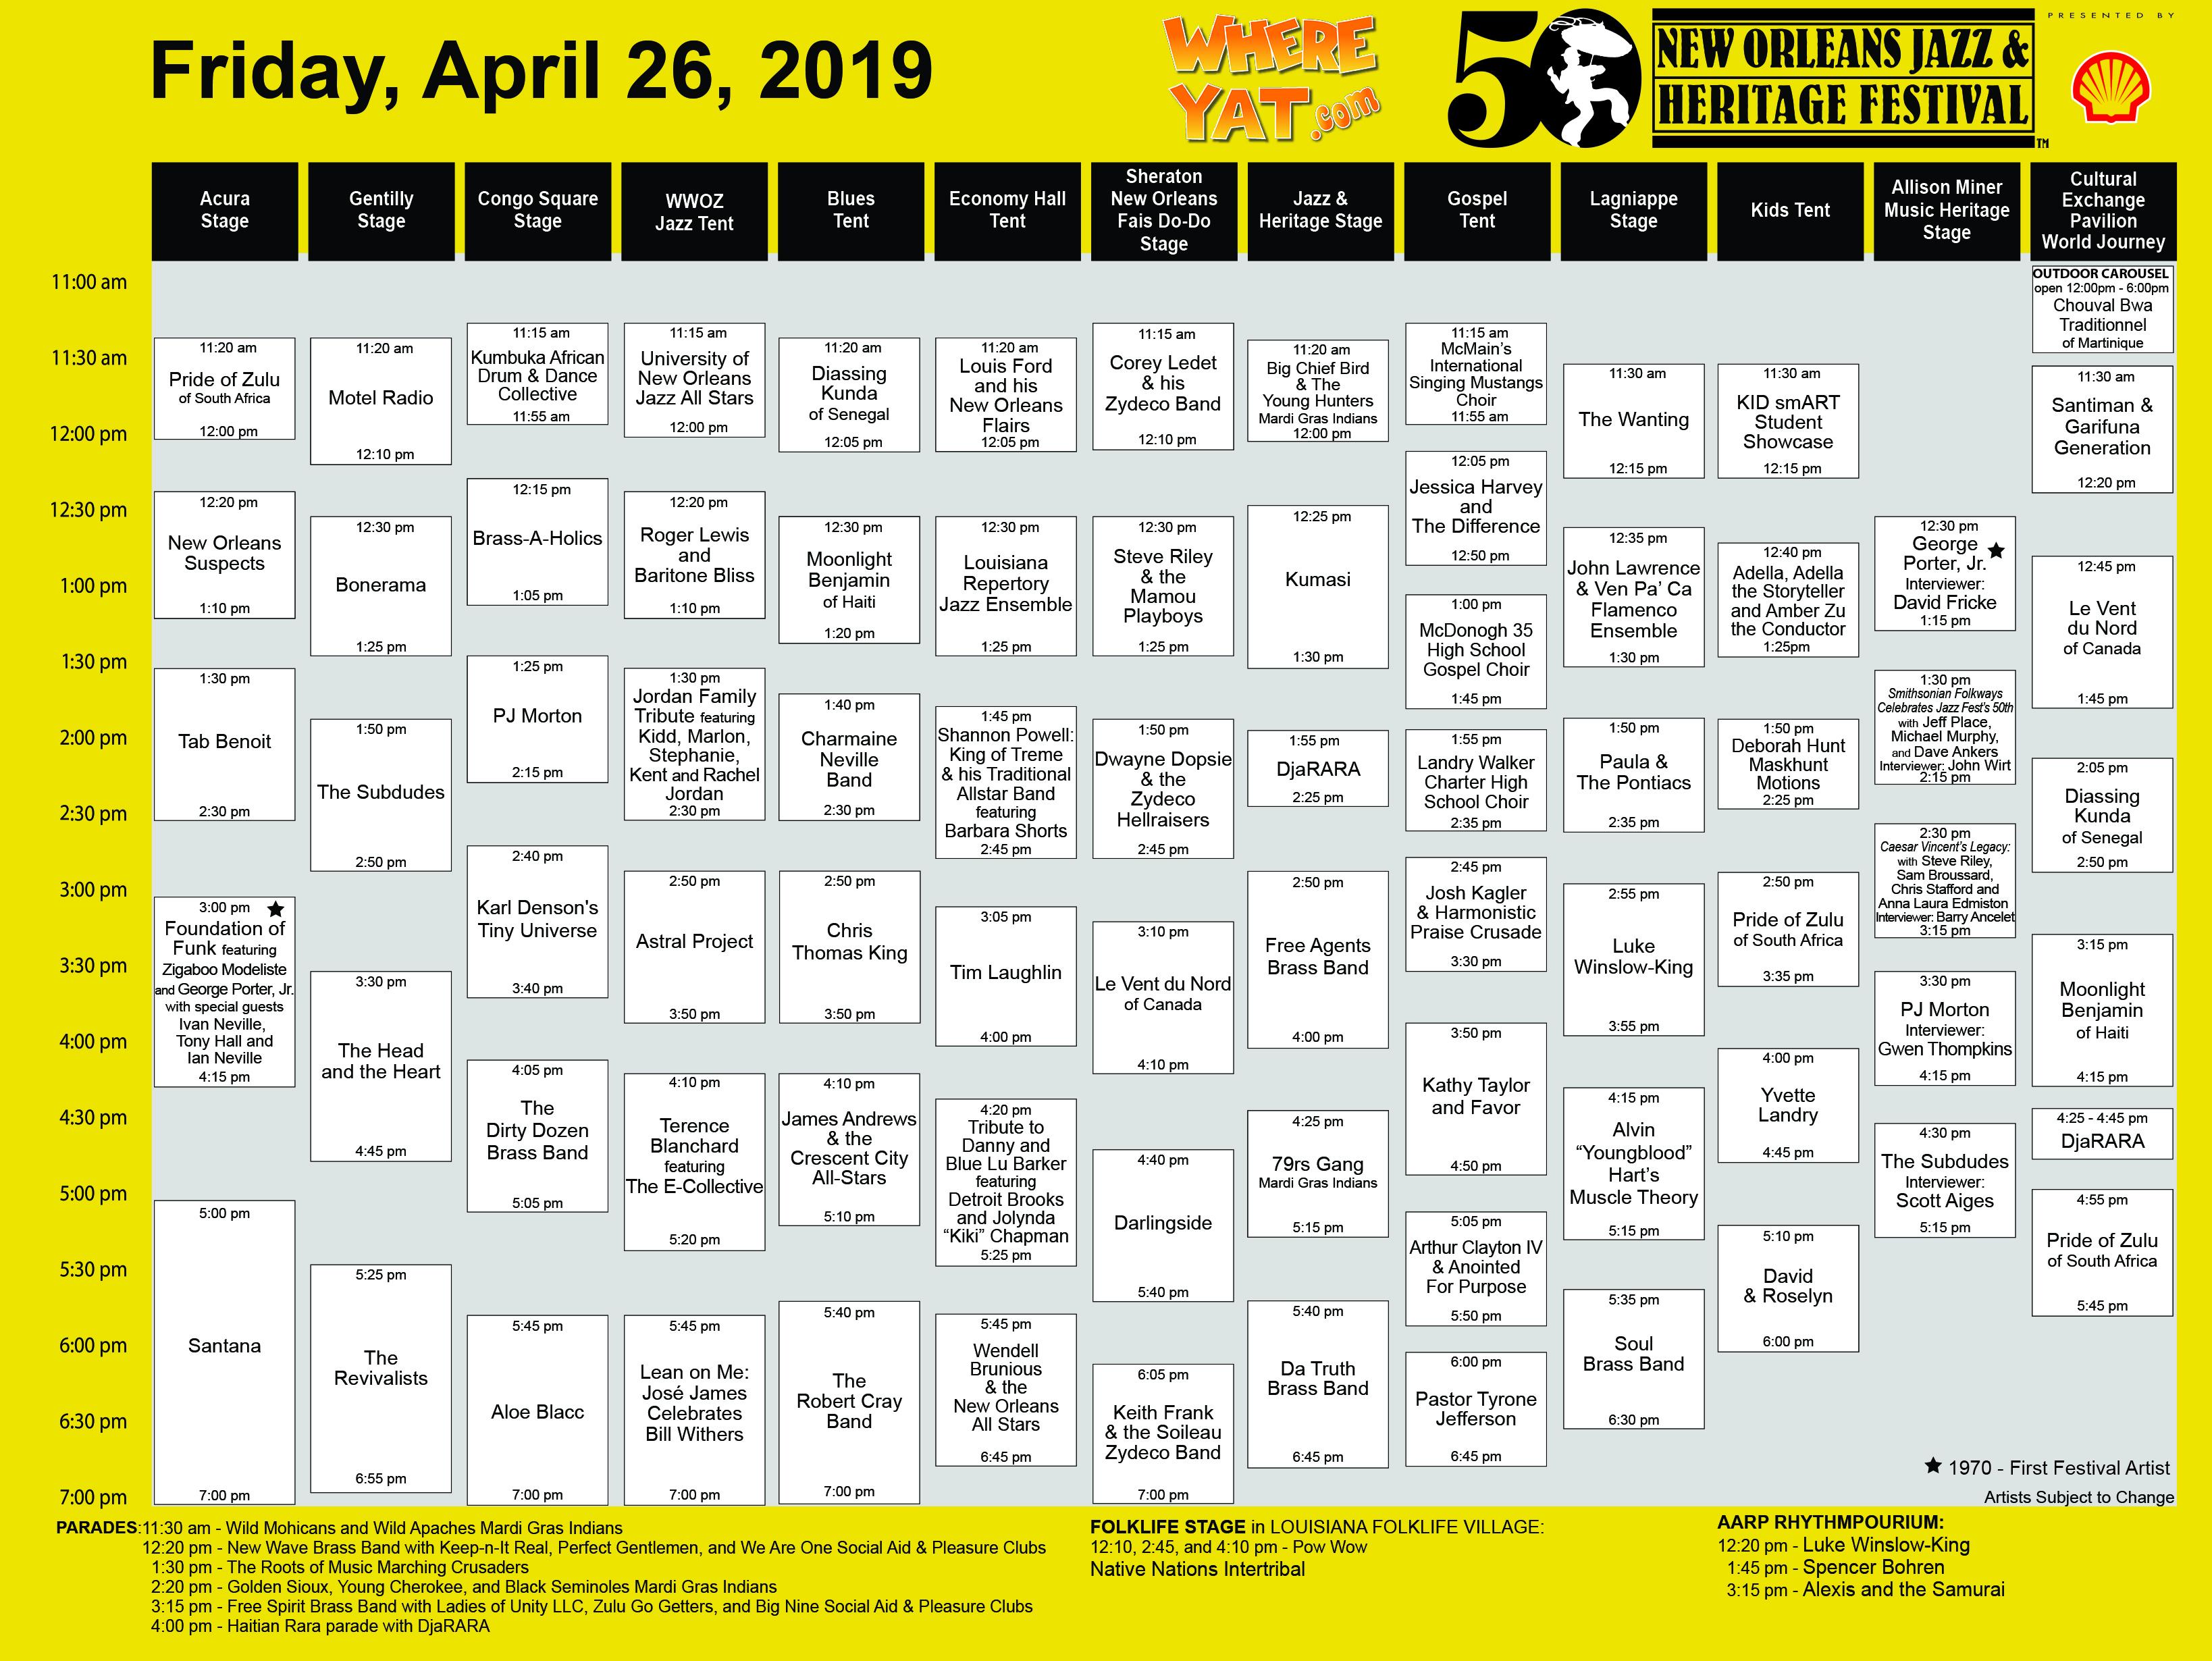 Jazz Fest 2019: Top Picks for Friday, April 26